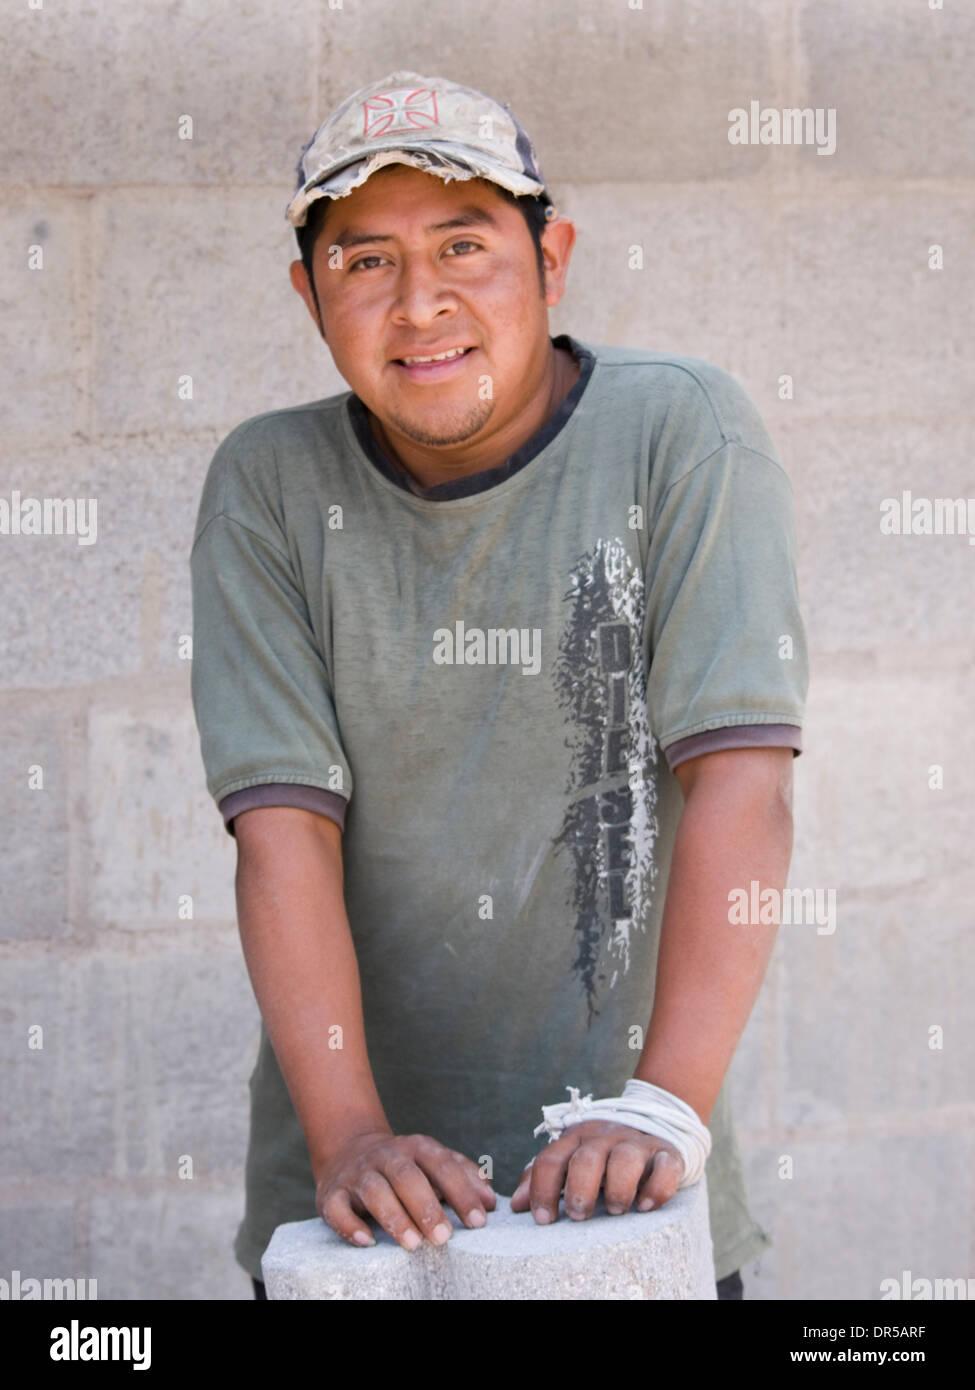 Mar 29, 2009 - Santiago Atitlan, Solola, Guatemala - Workers in santiago Atitlan, Solola, Guatemala (Credit Image: © David H. Wells/ZUMAPRESS.com) - Stock Image